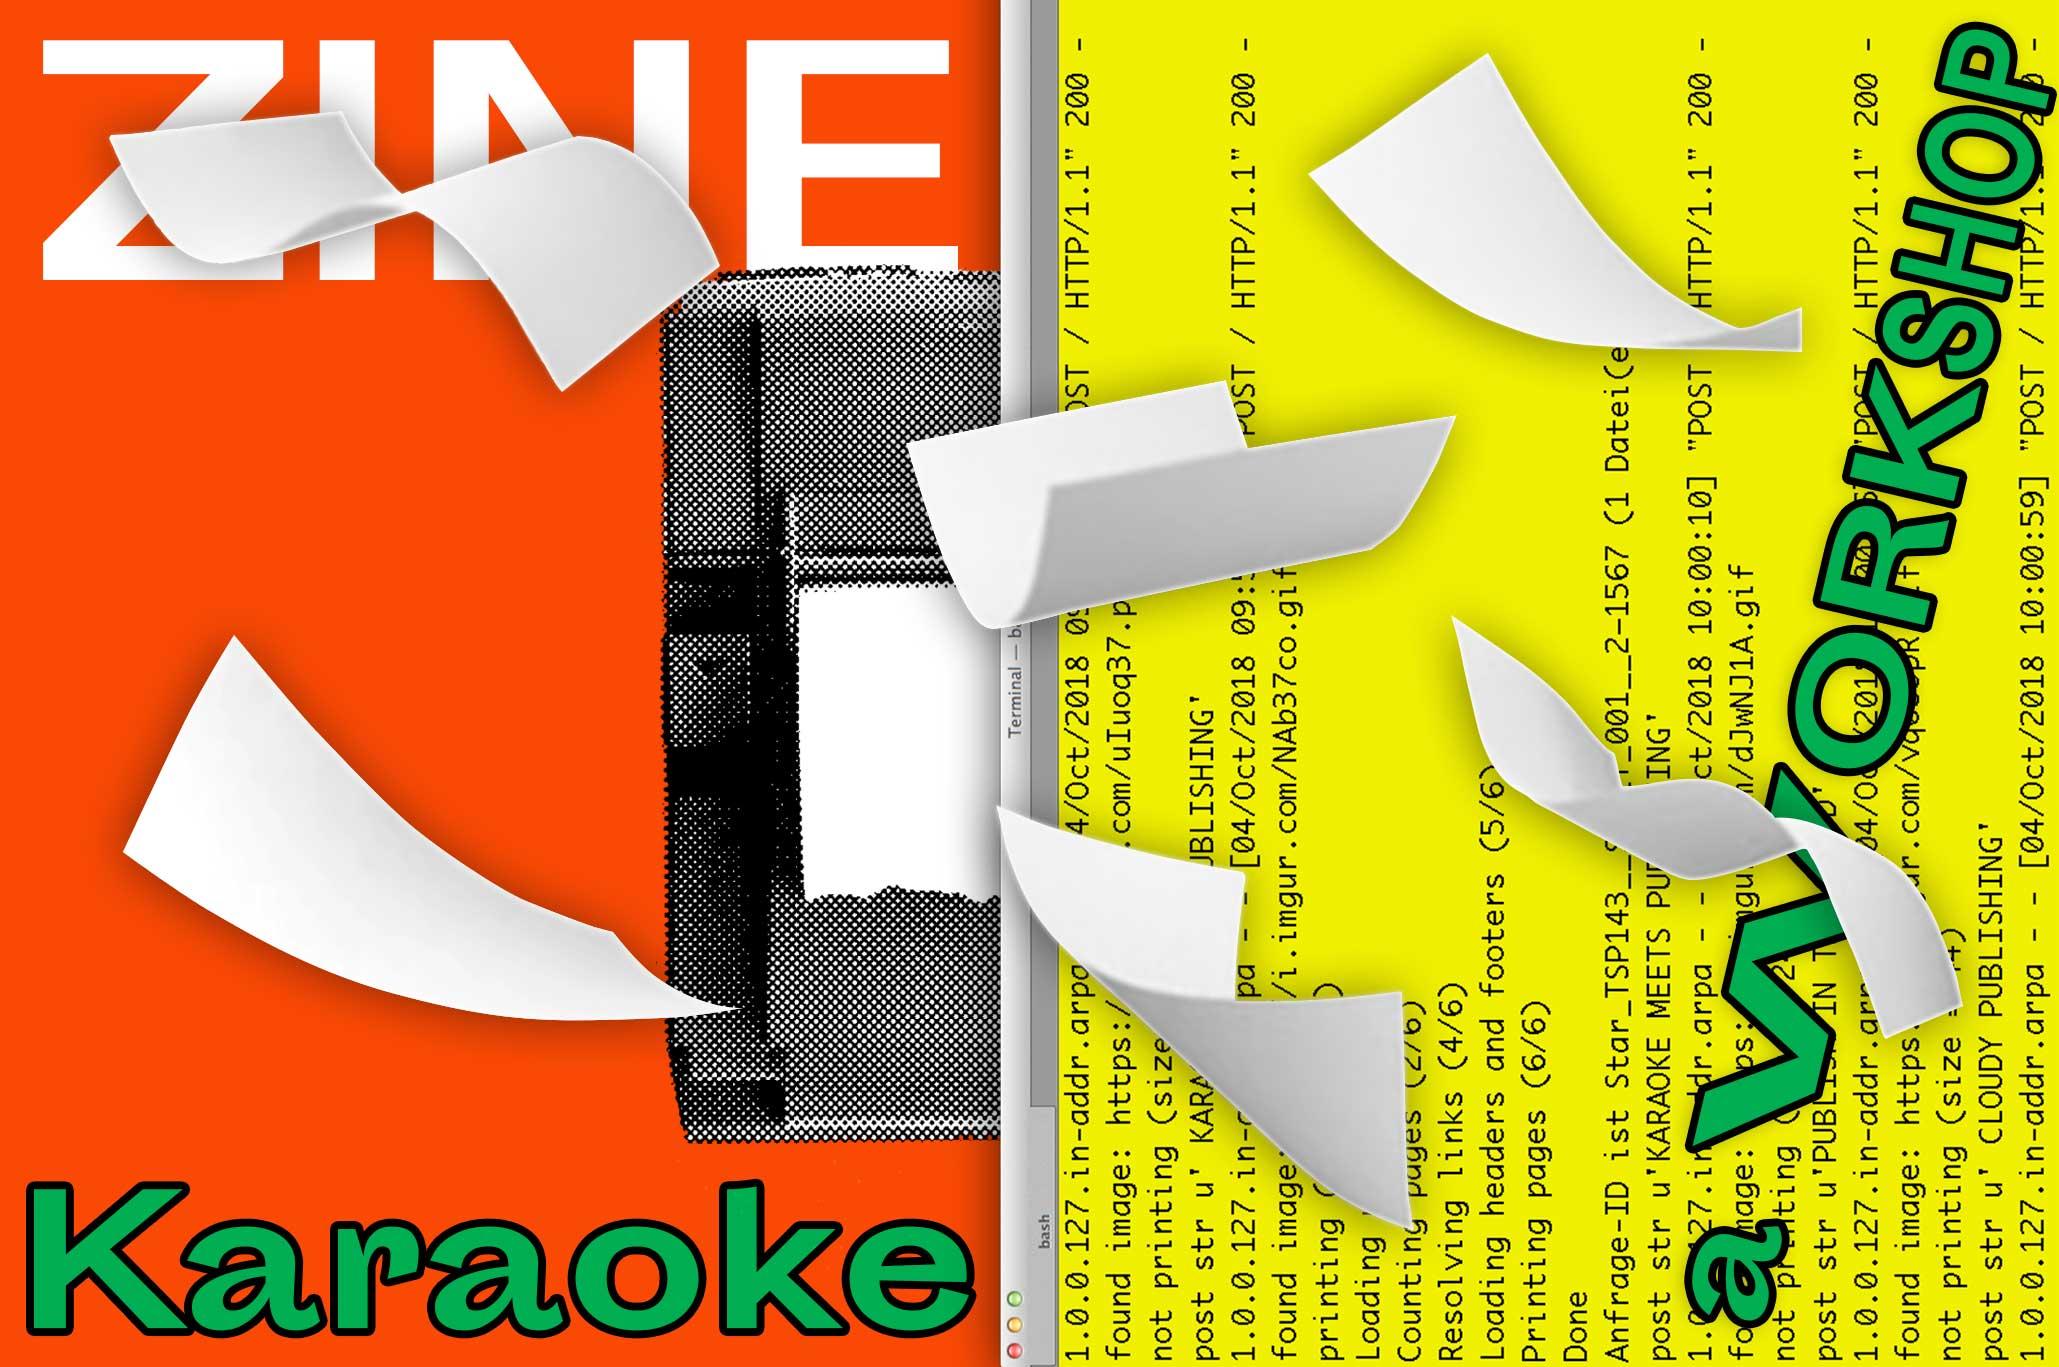 Zine karaoke announced.jpg